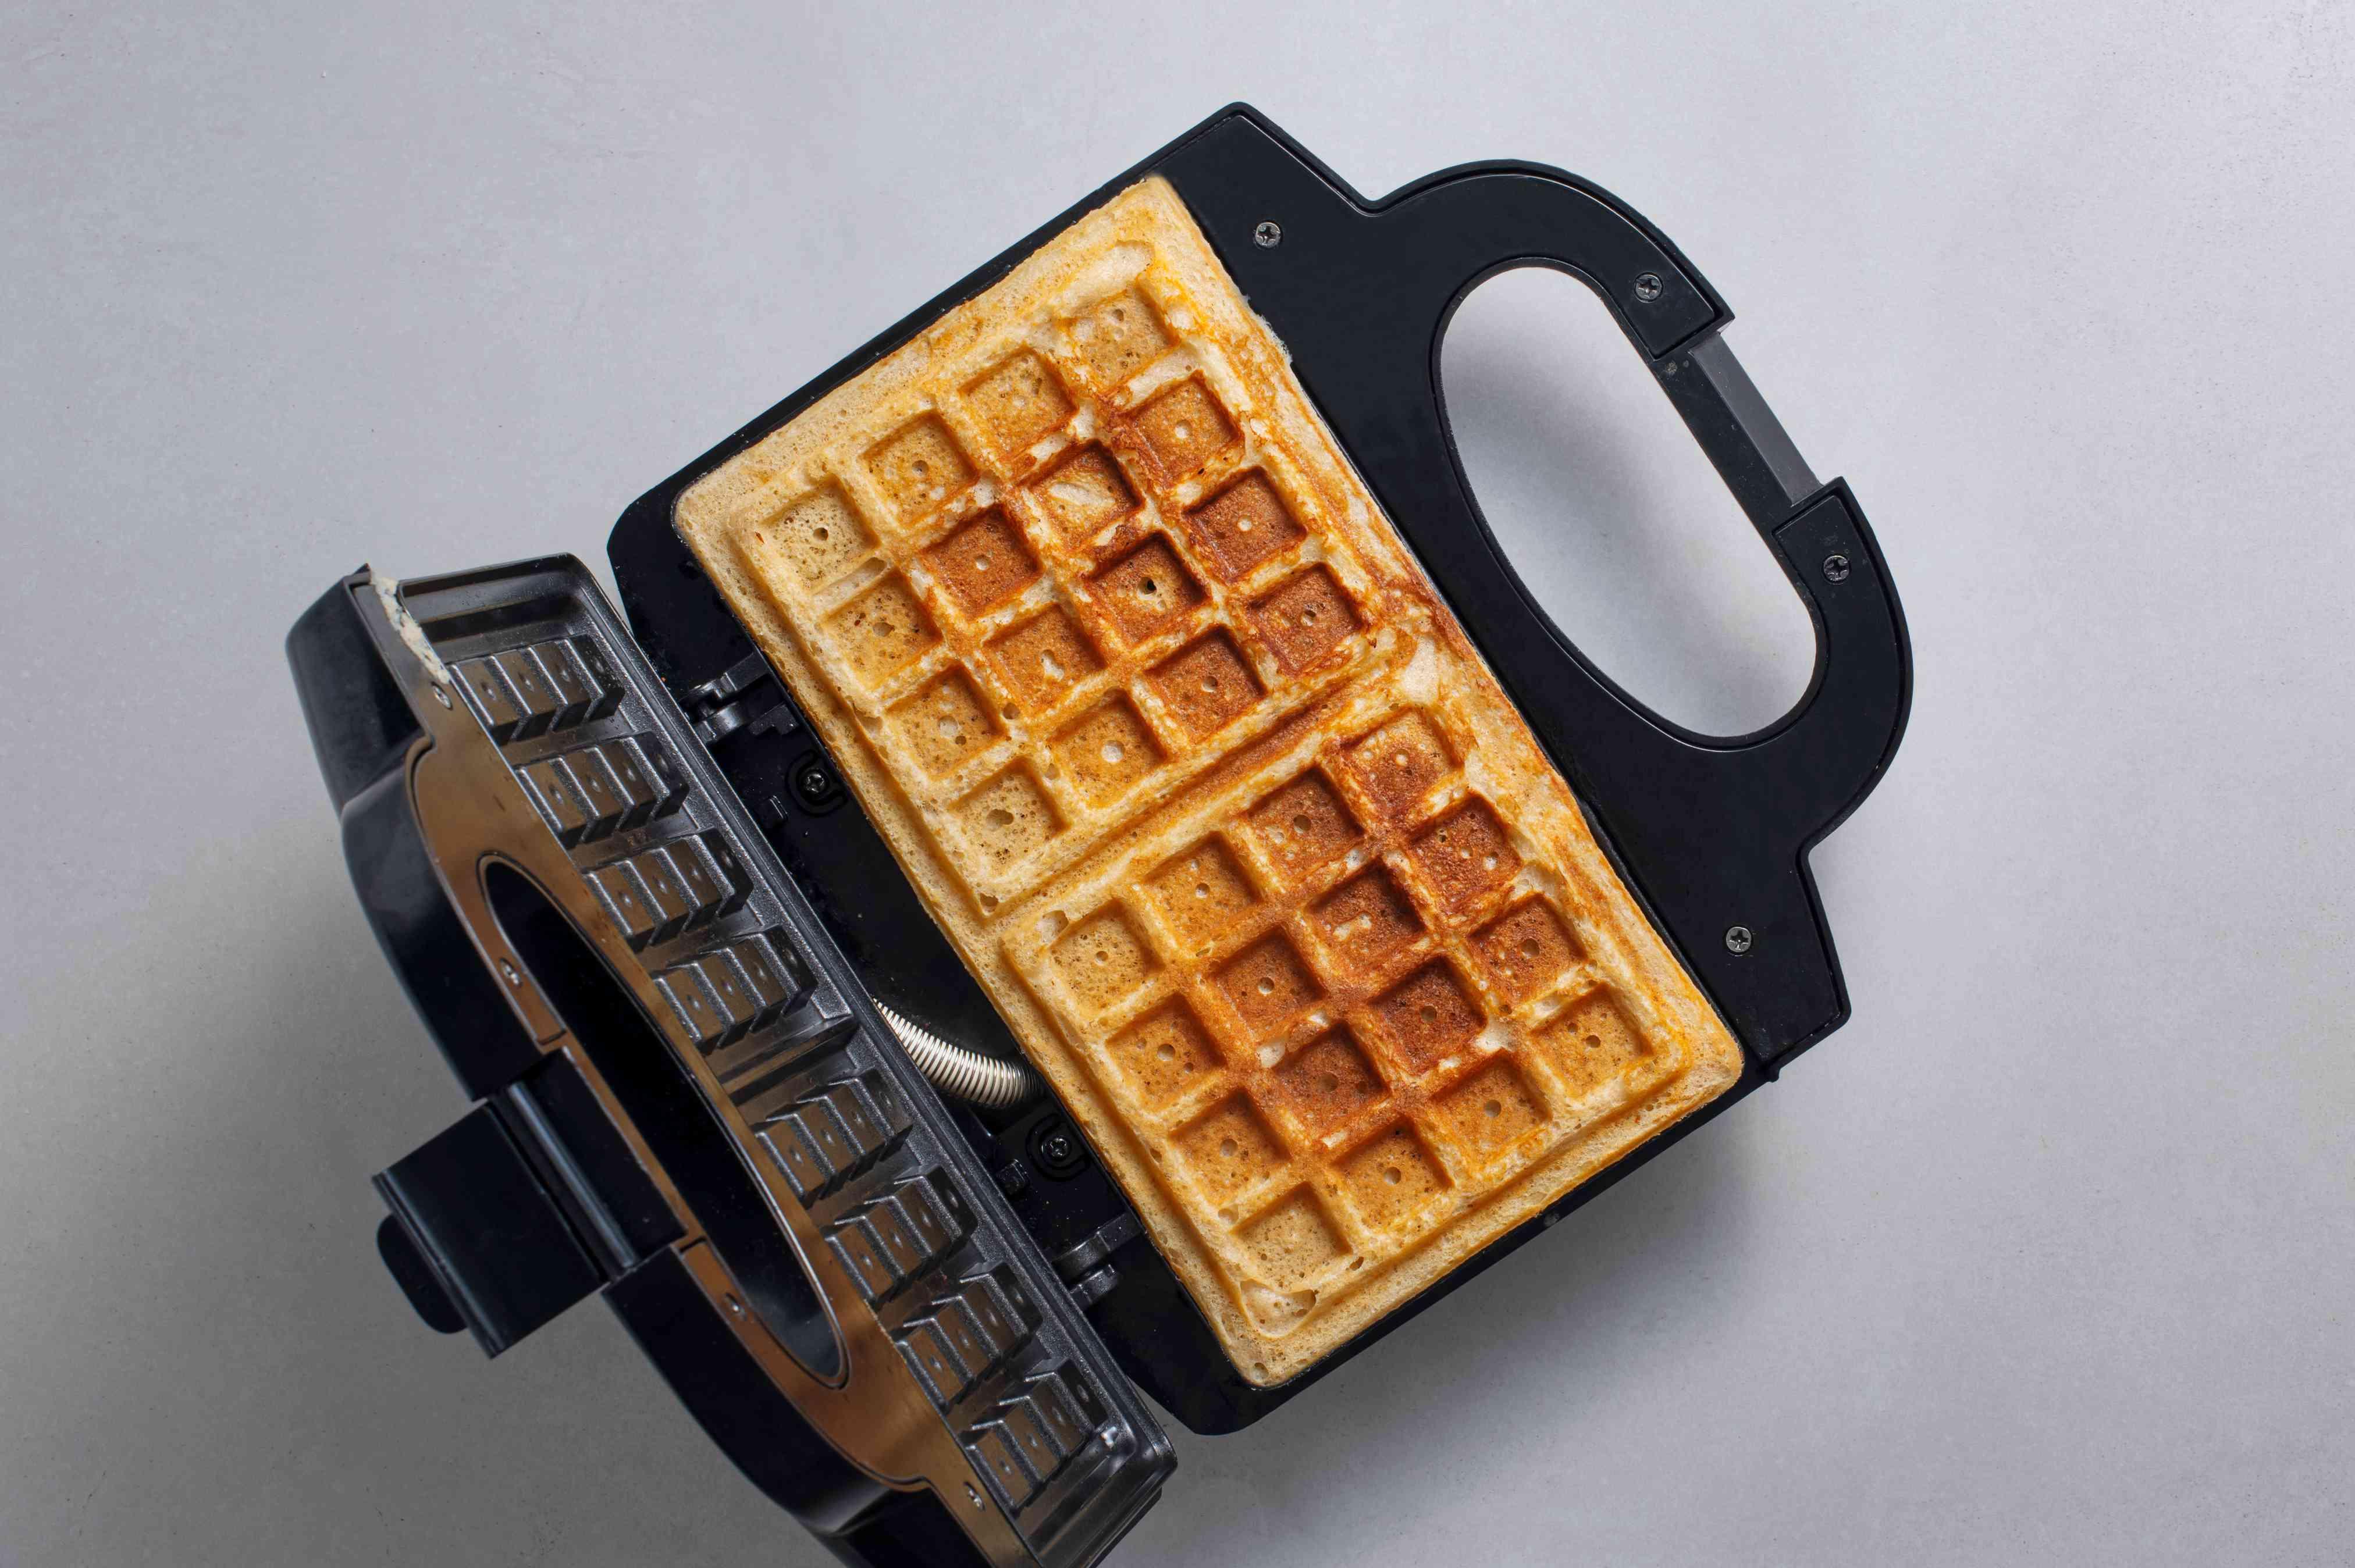 Waffles in a waffle maker